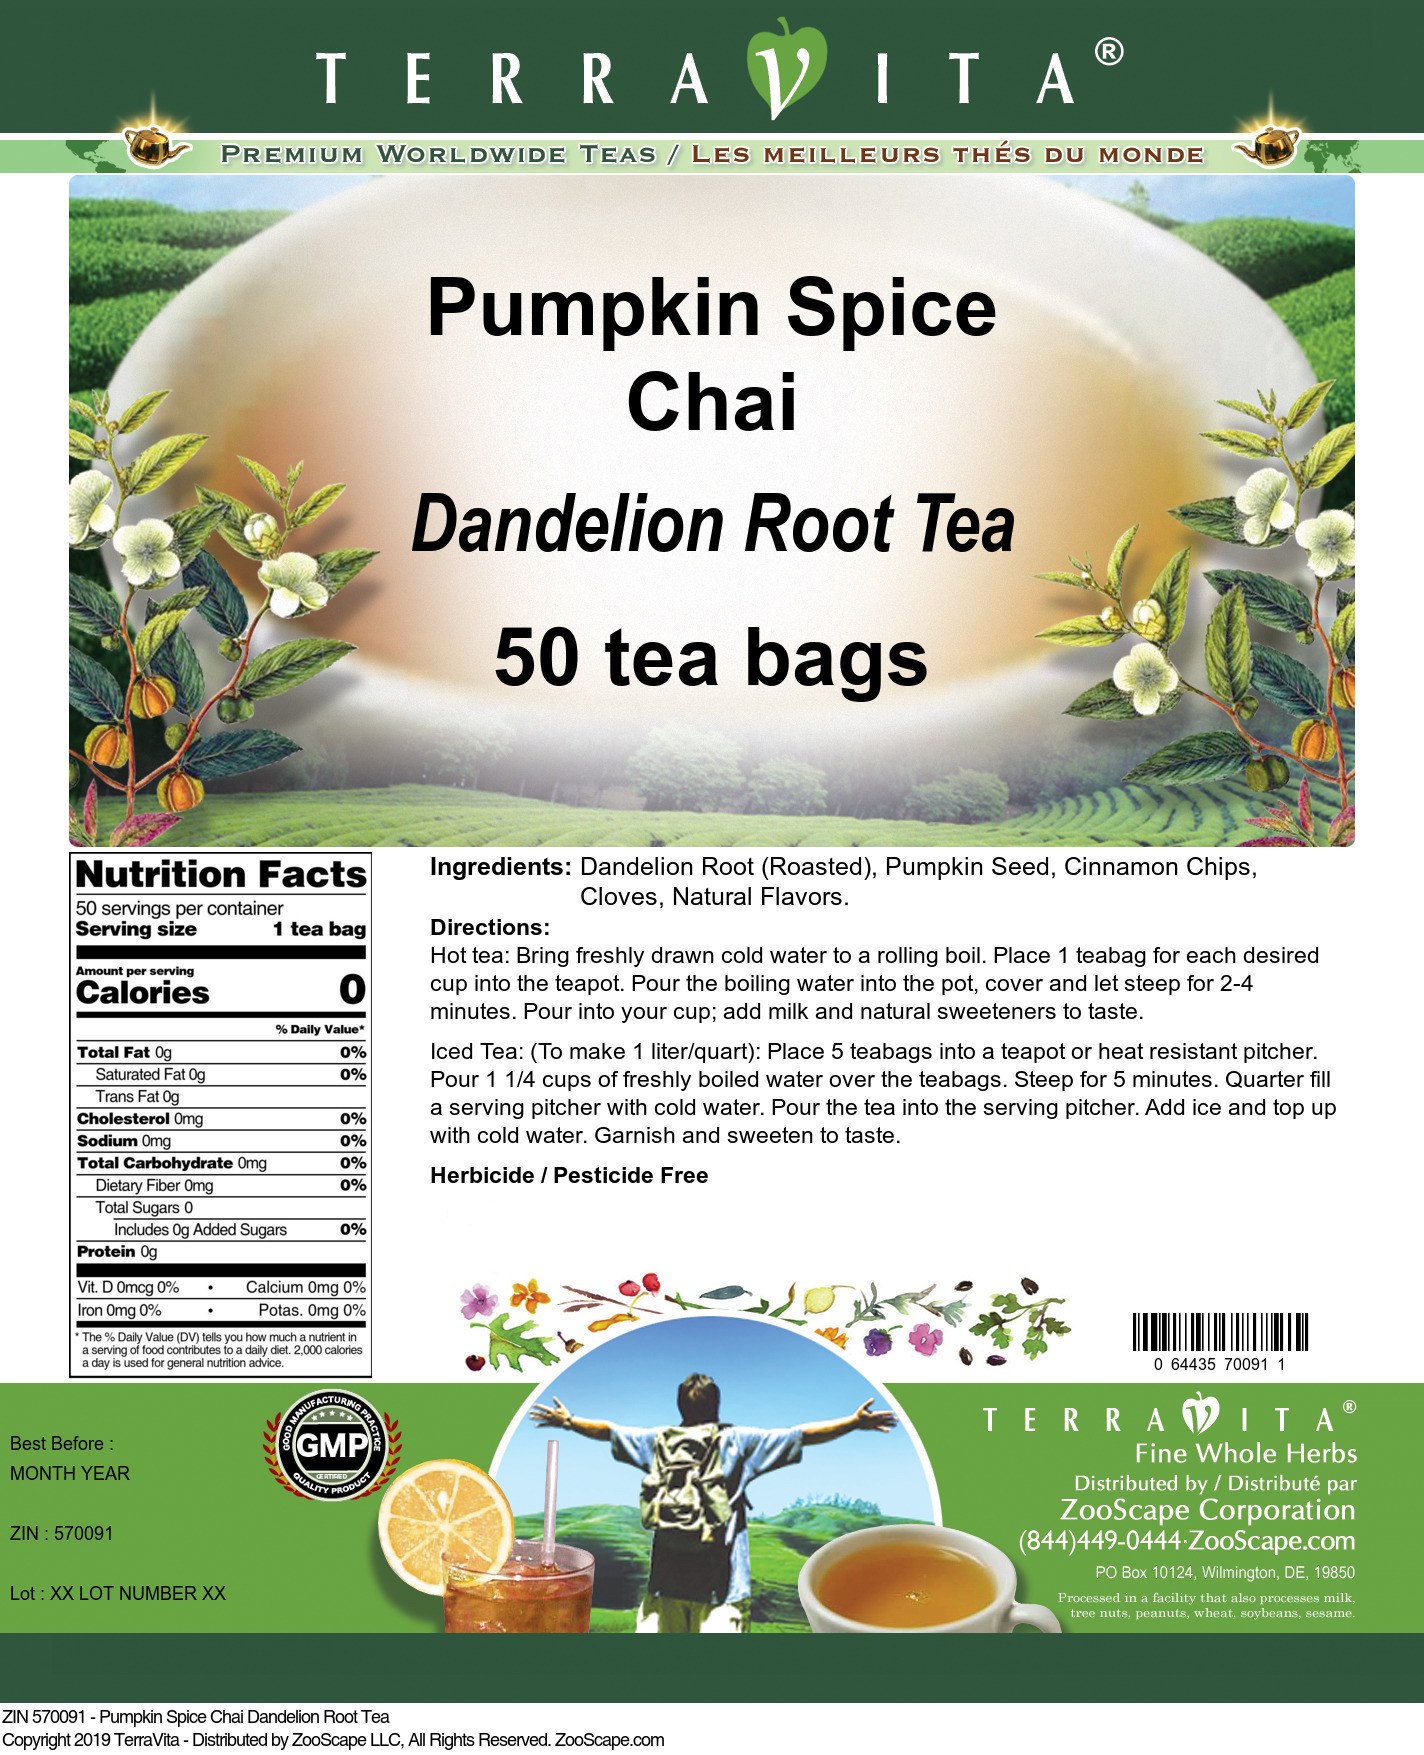 Pumpkin Spice Chai Dandelion Root